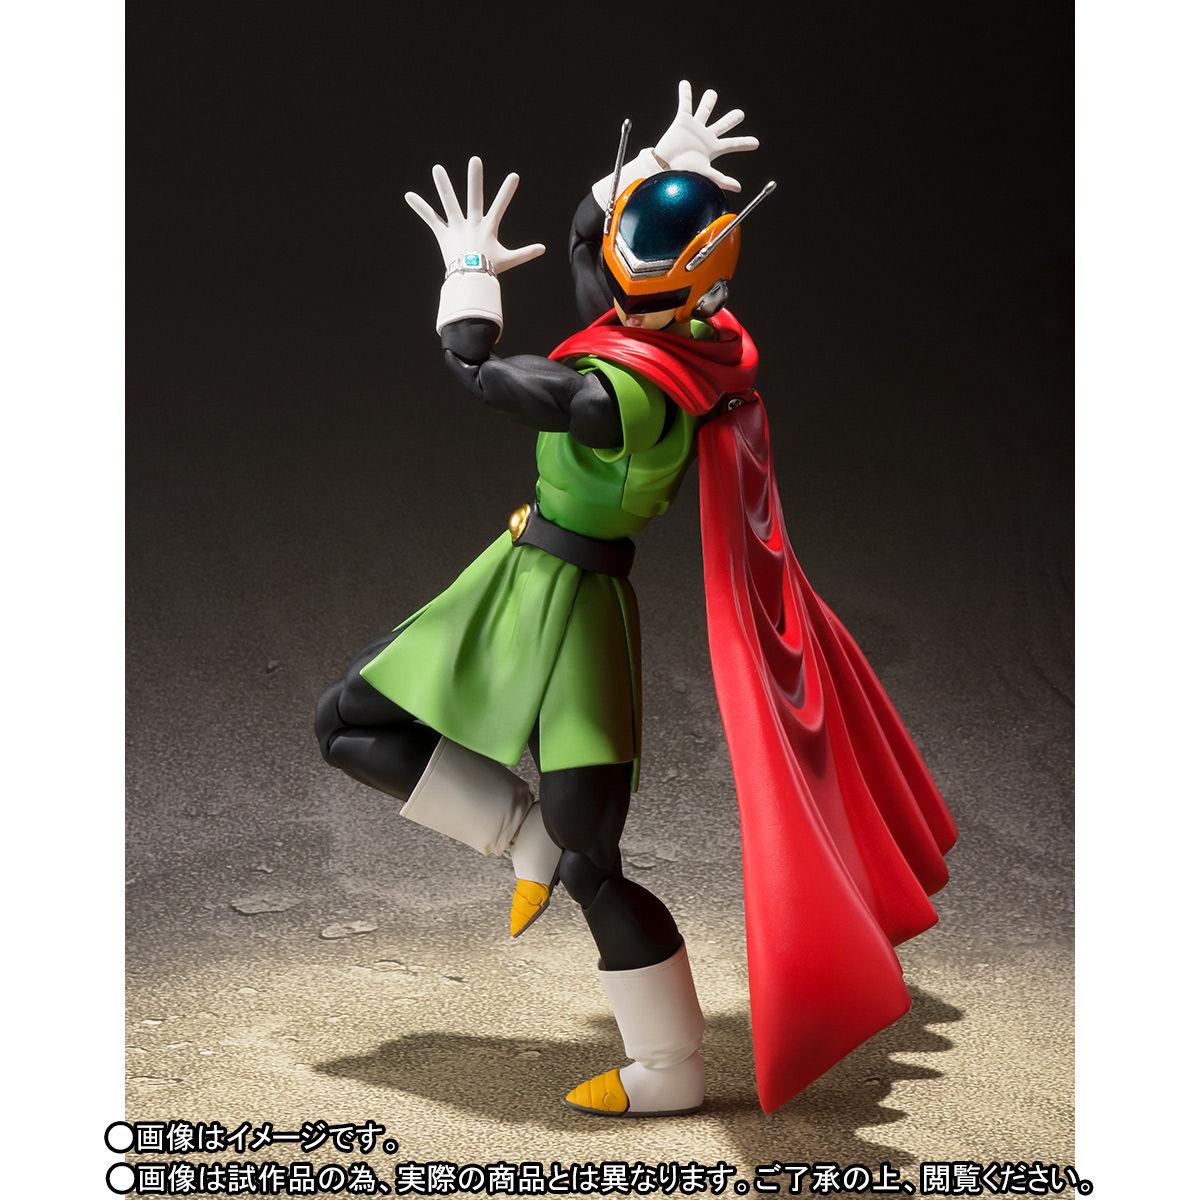 S.H.フィギュアーツ『グレートサイヤマン』ドラゴンボールZ 可動フィギュア-002